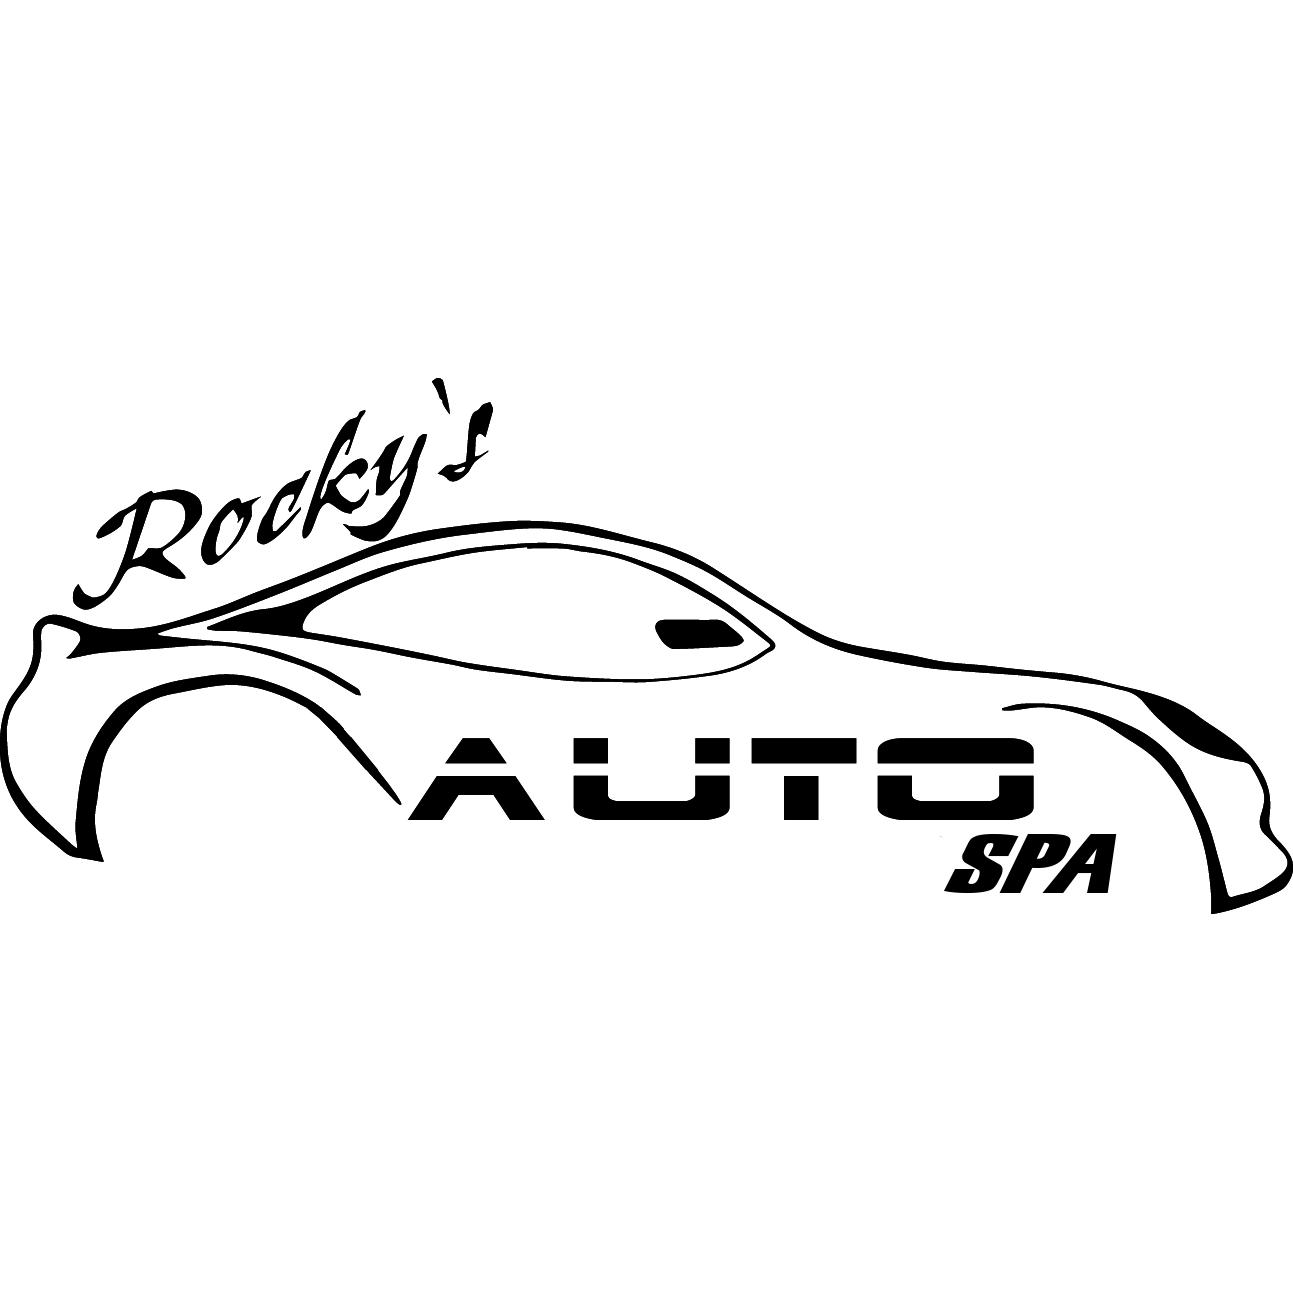 Rocky's Auto Spa